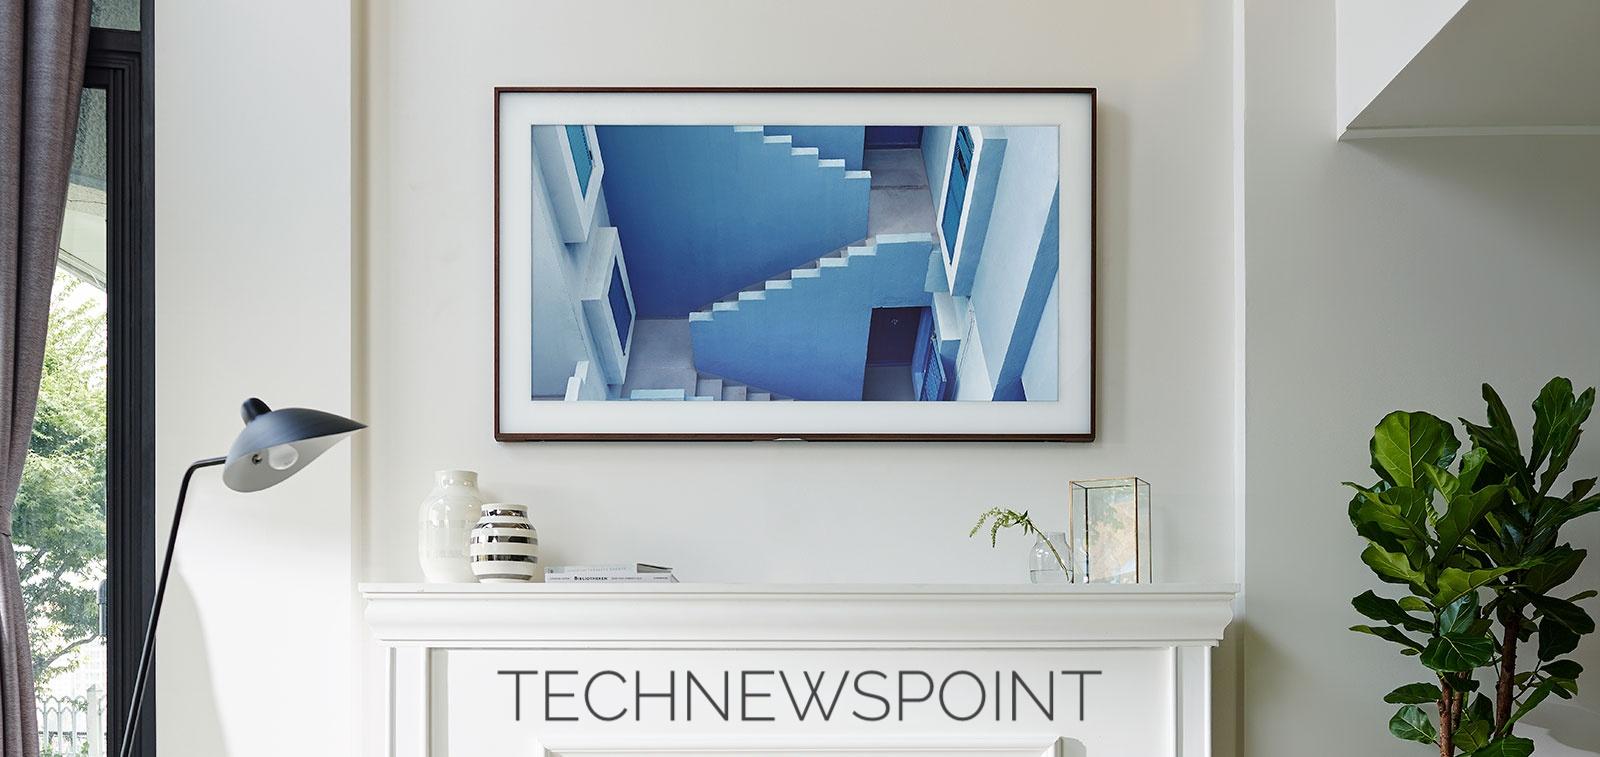 technewspoint. Black Bedroom Furniture Sets. Home Design Ideas